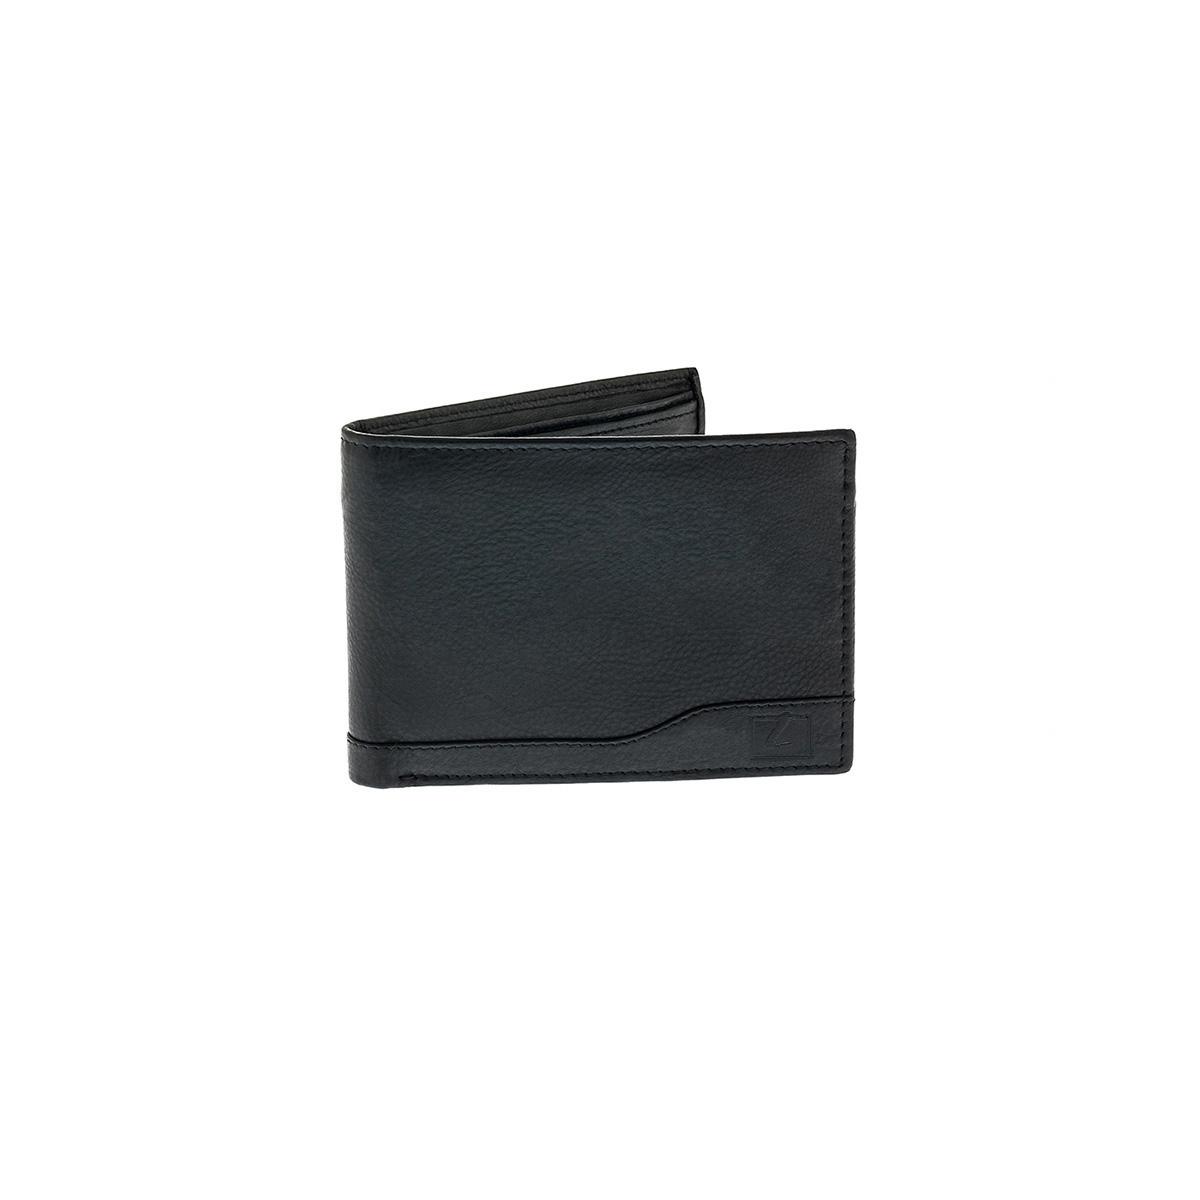 029da7c8bb Δερμάτινο Πορτοφόλι Μεγάλο Με Φερμουάρ Χαρτονομισμάτων Lavor RFID 7105 Μαύρο